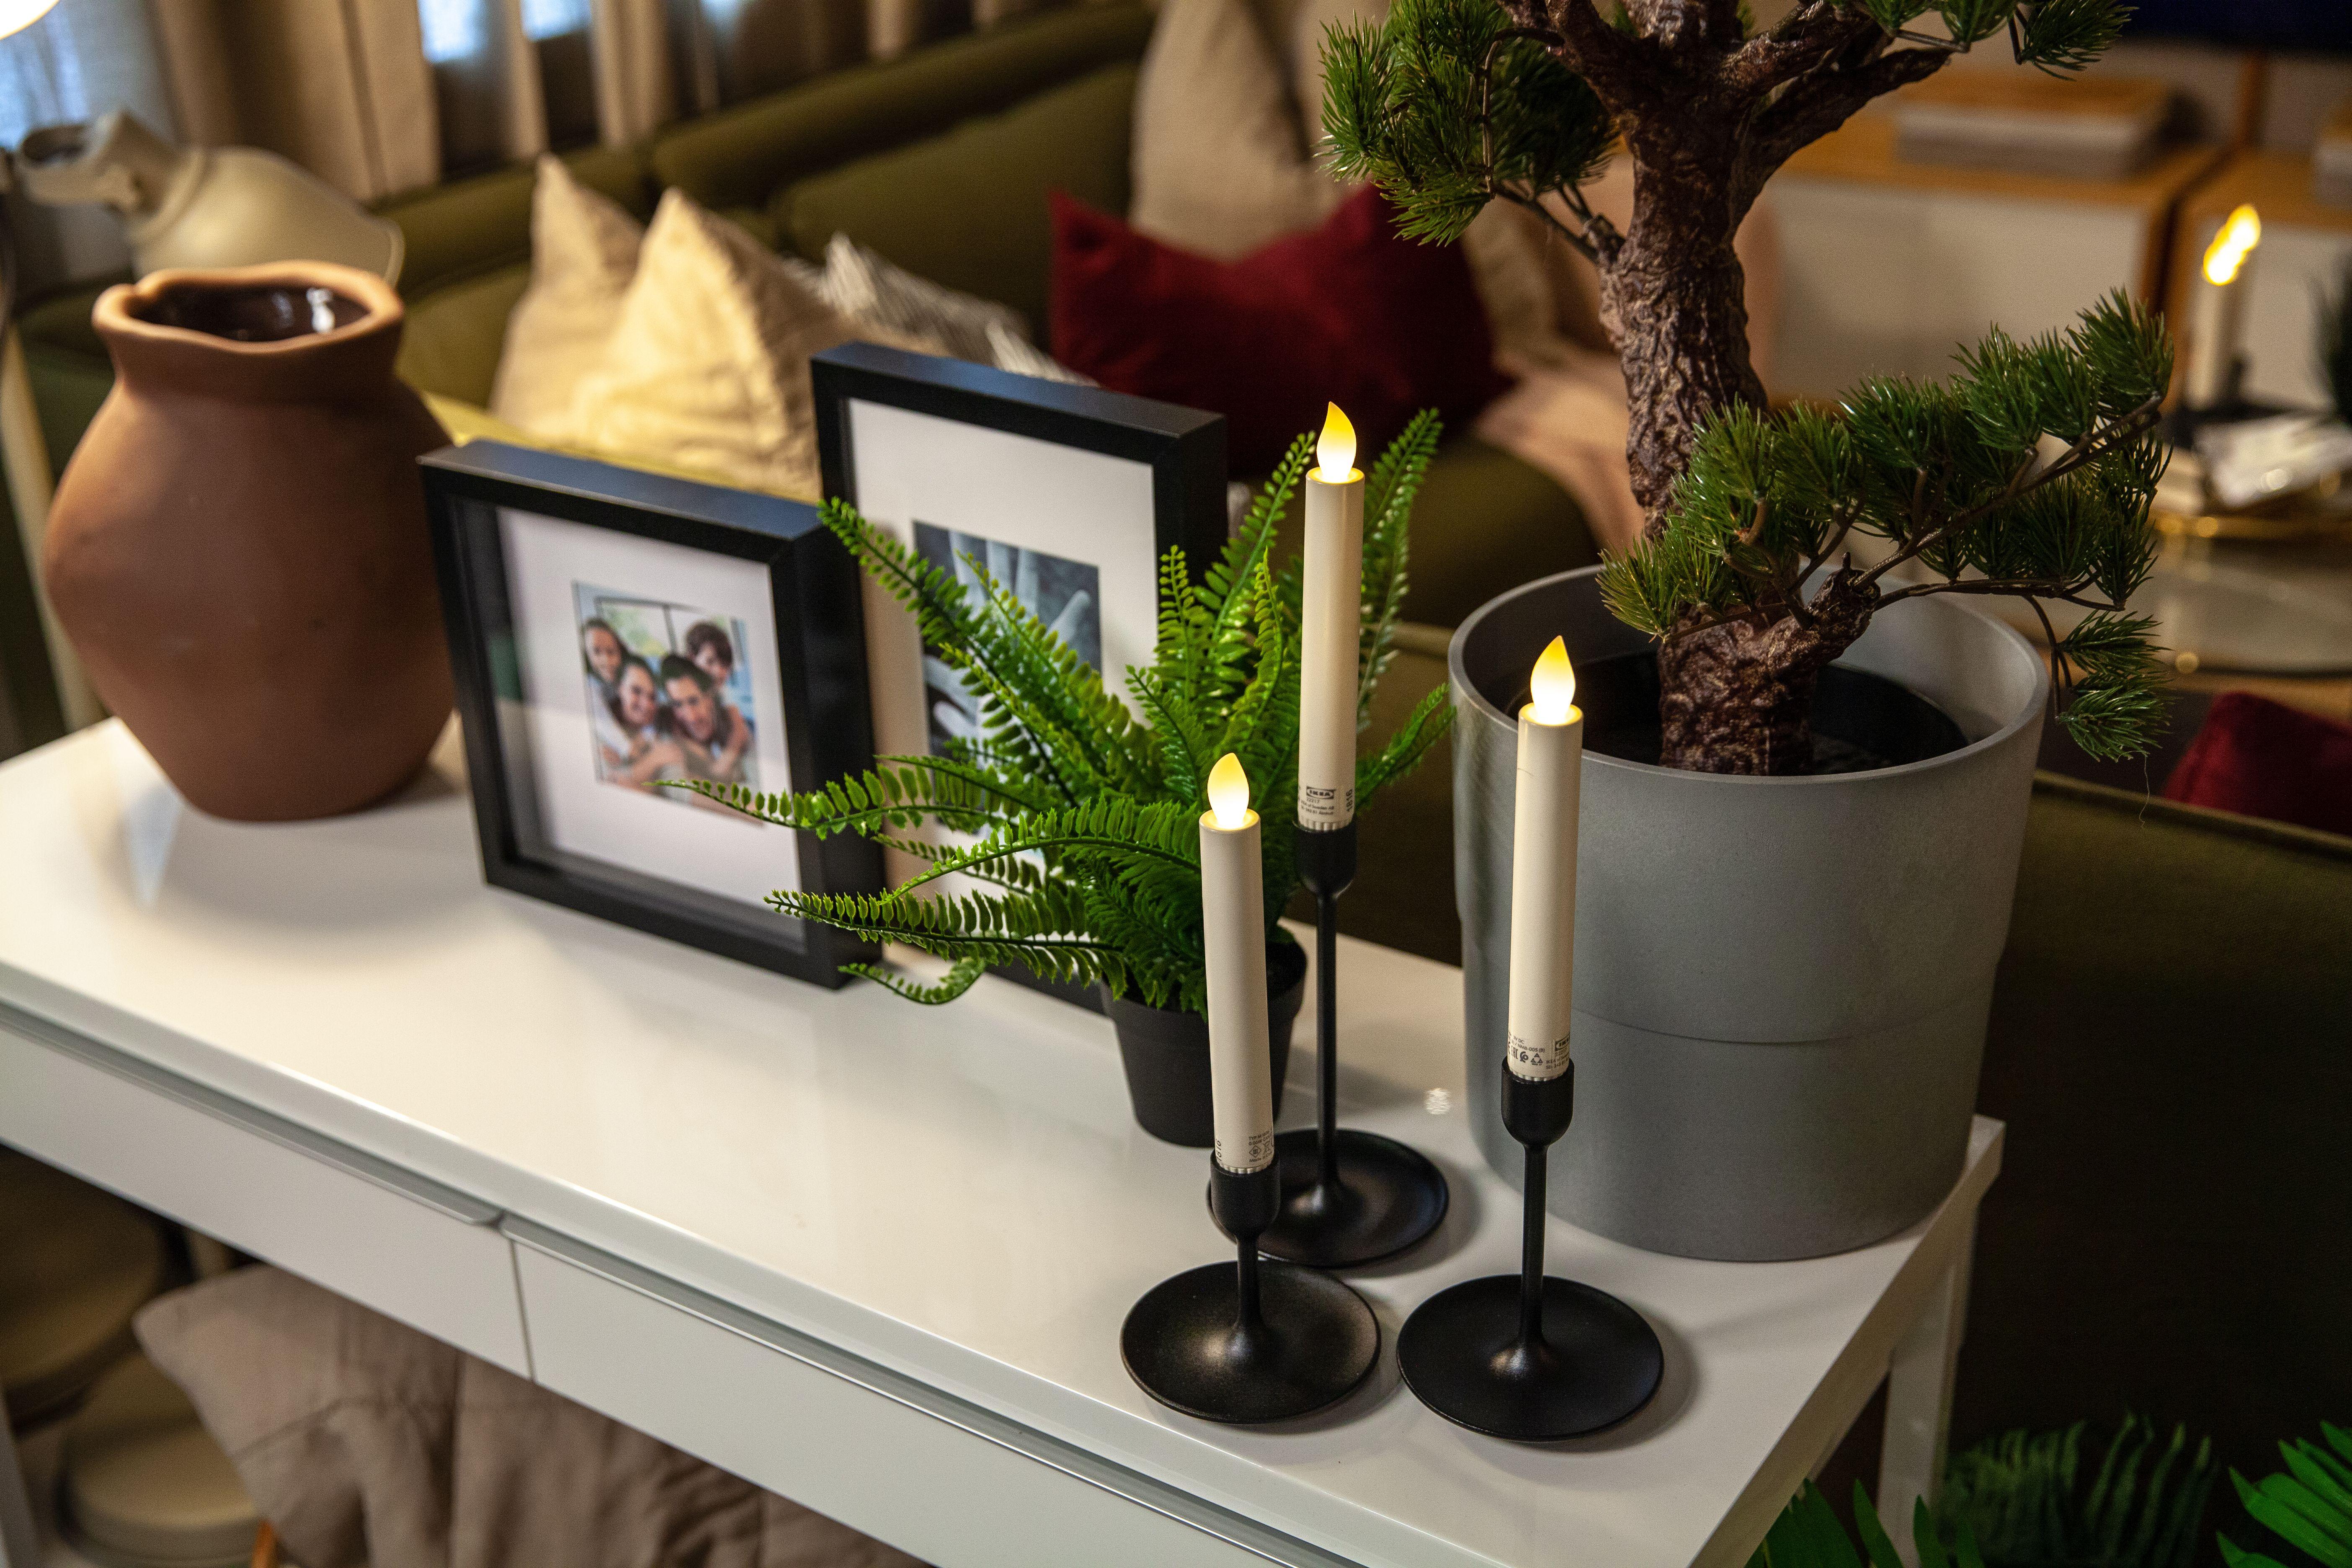 Console Decorating تنسيق للكونسول Ikea Living Room Design Planning Signature Design